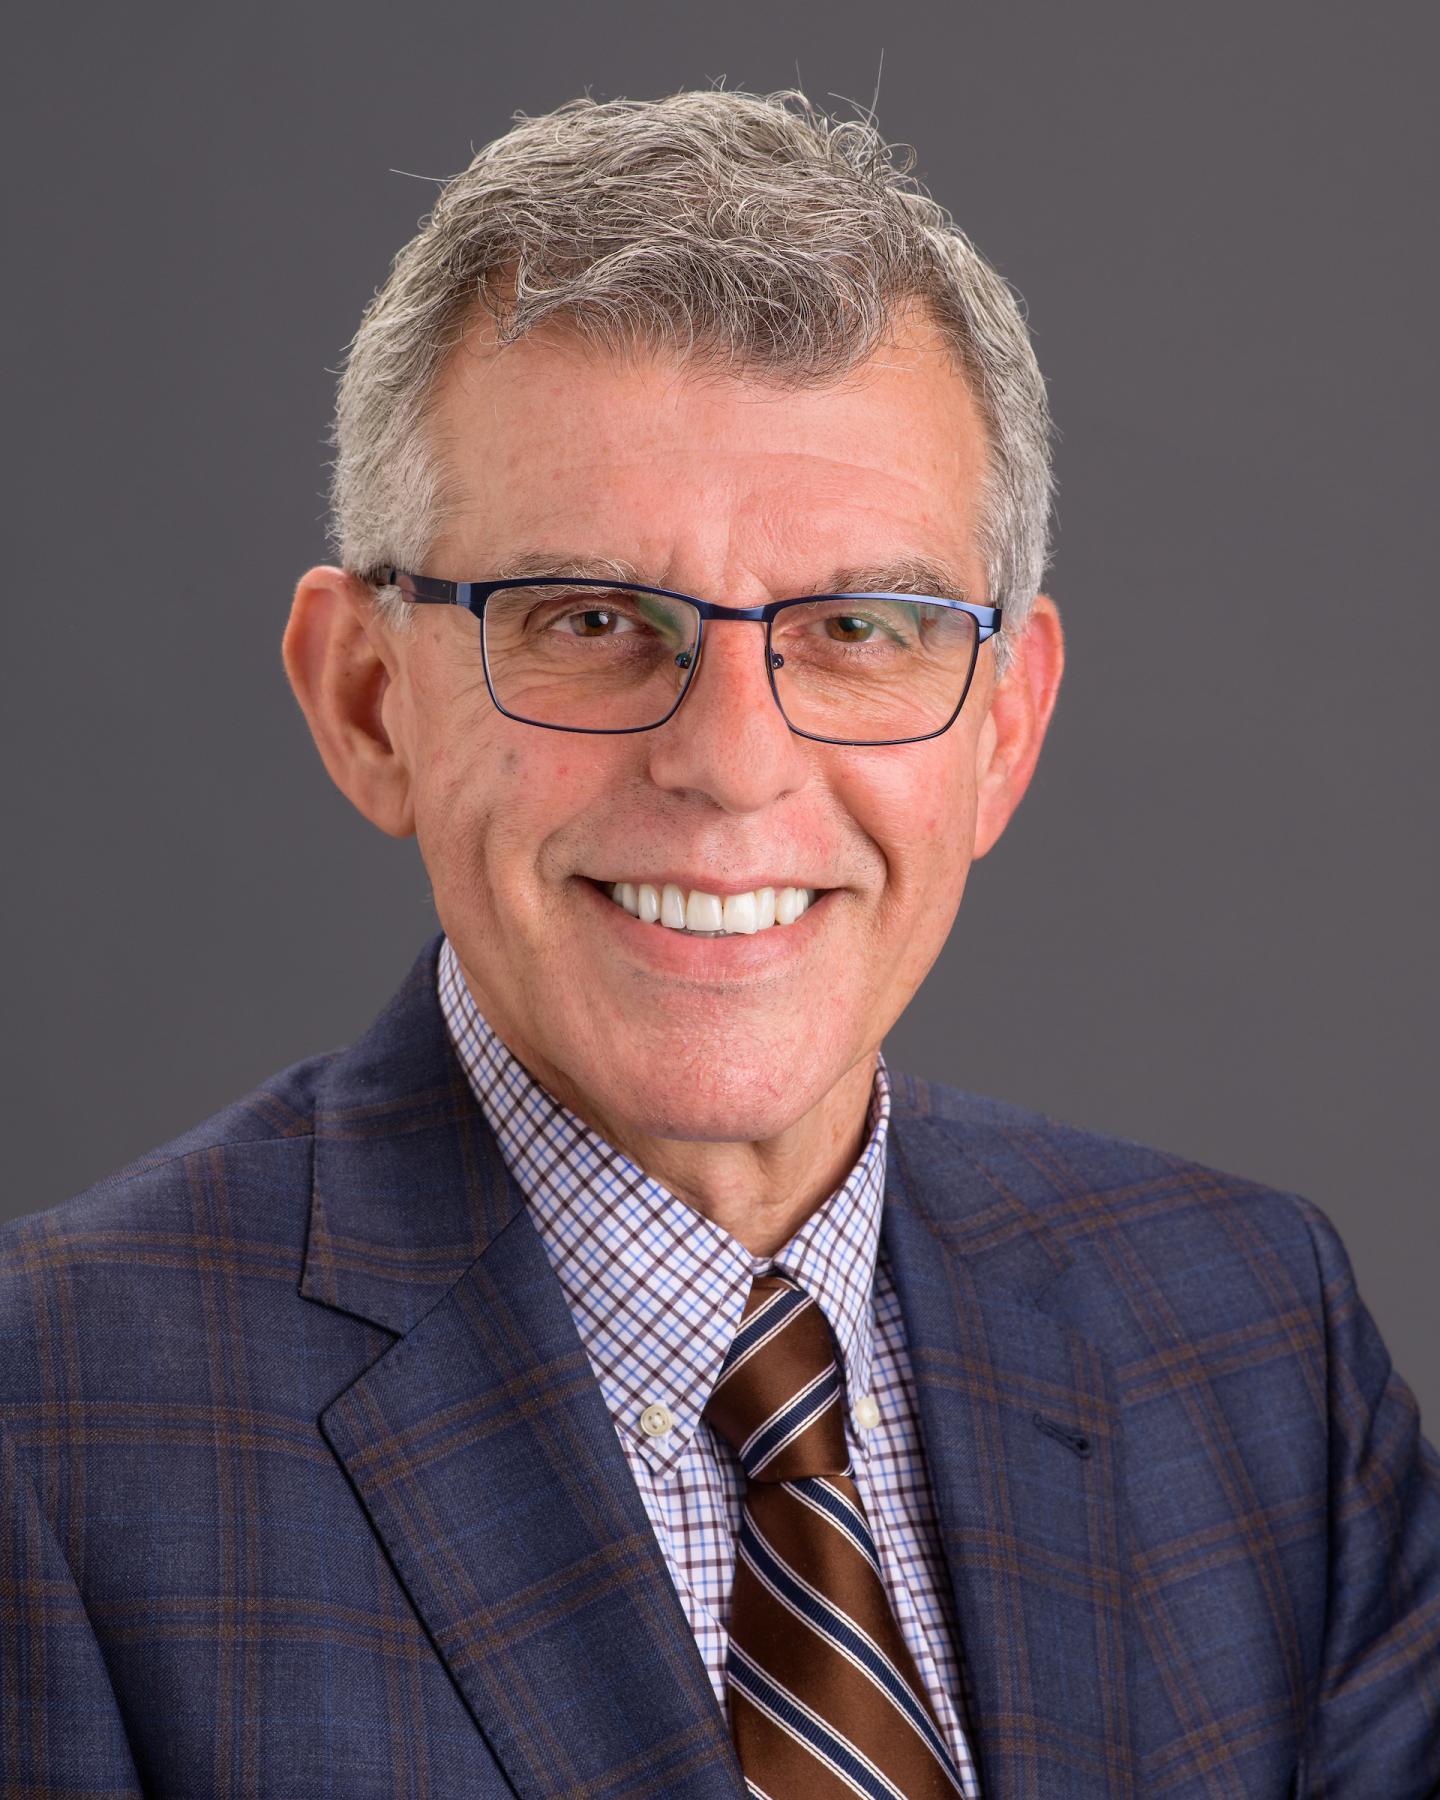 David Gozal, University of Missouri-Columbia